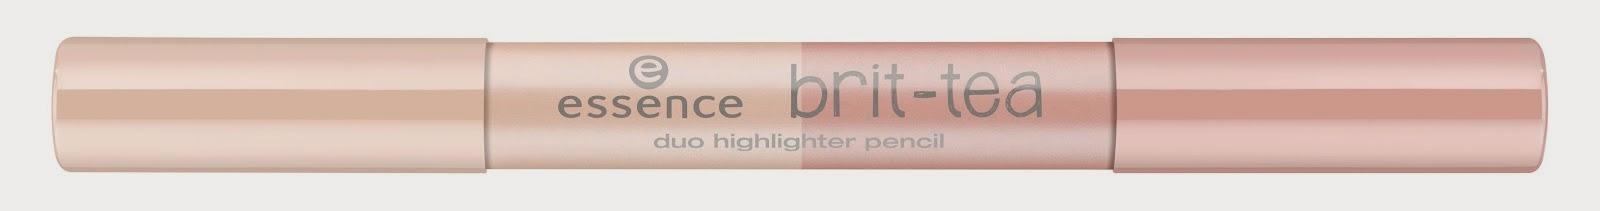 "essence LE ""Brit-Tea"""